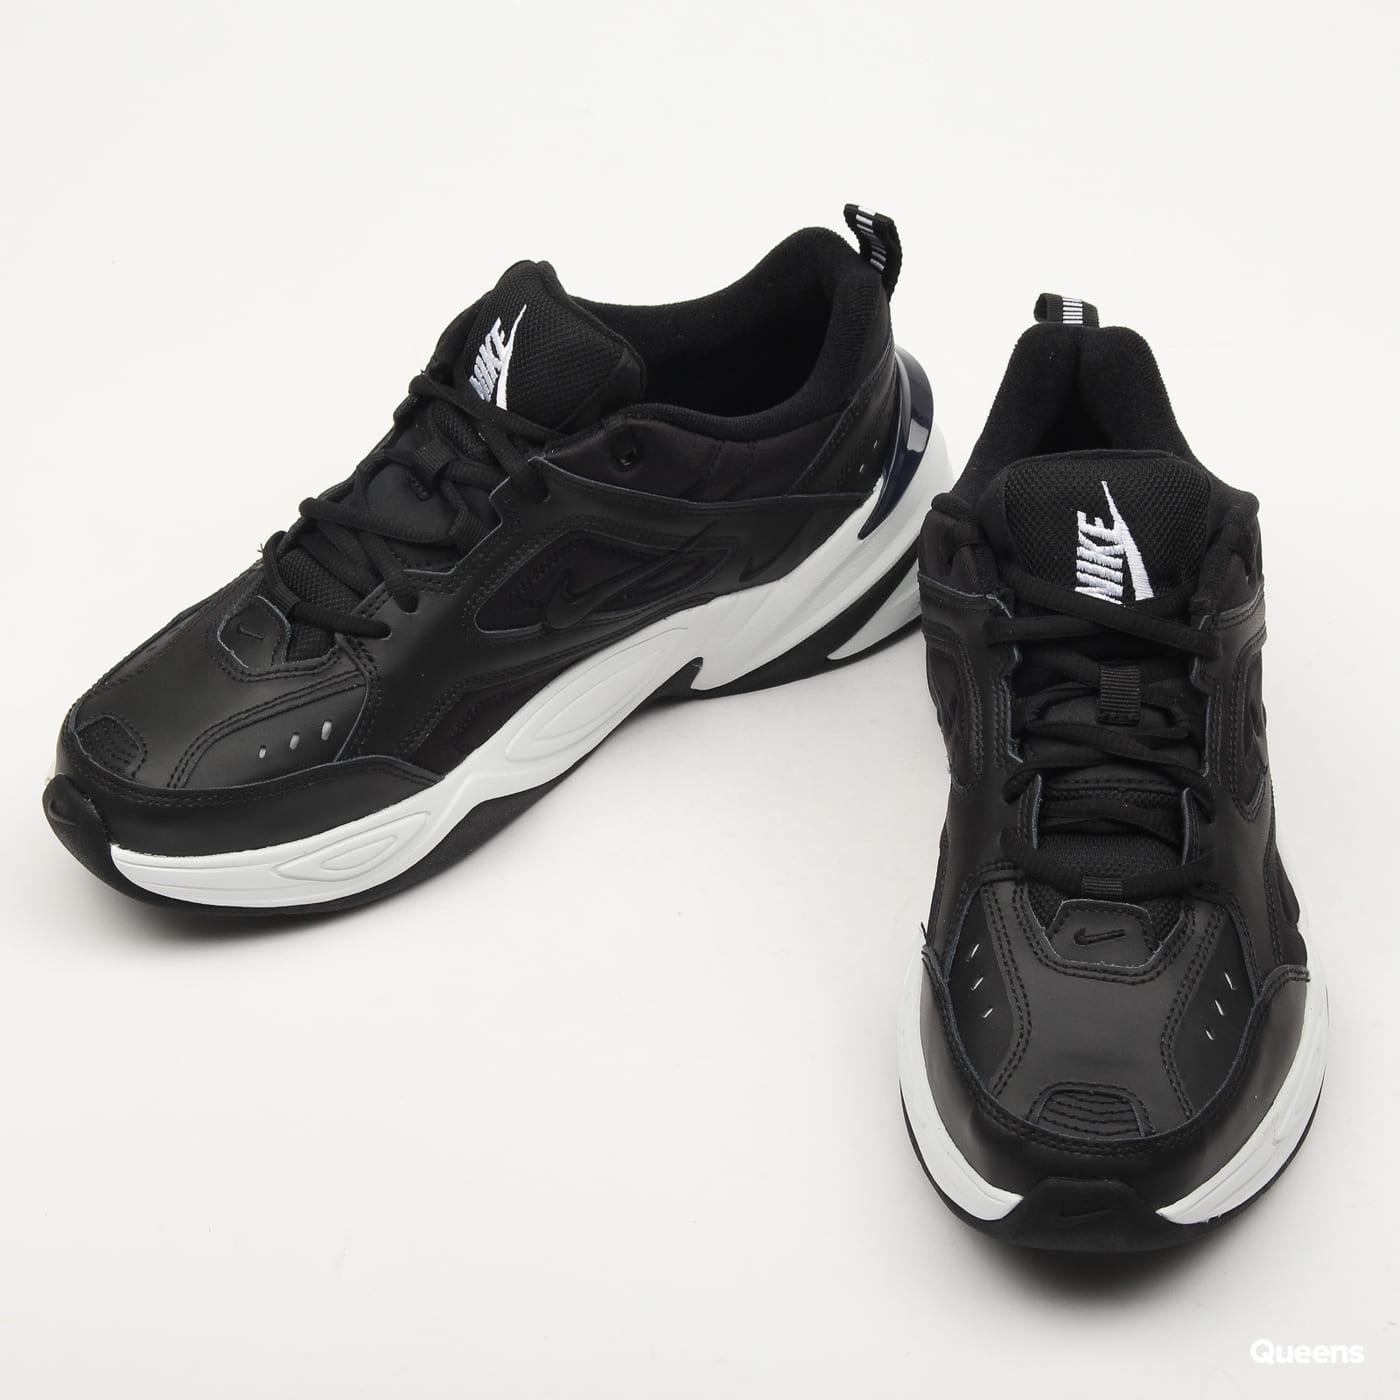 Nike M2K Tekno black / black - off white - obsidian